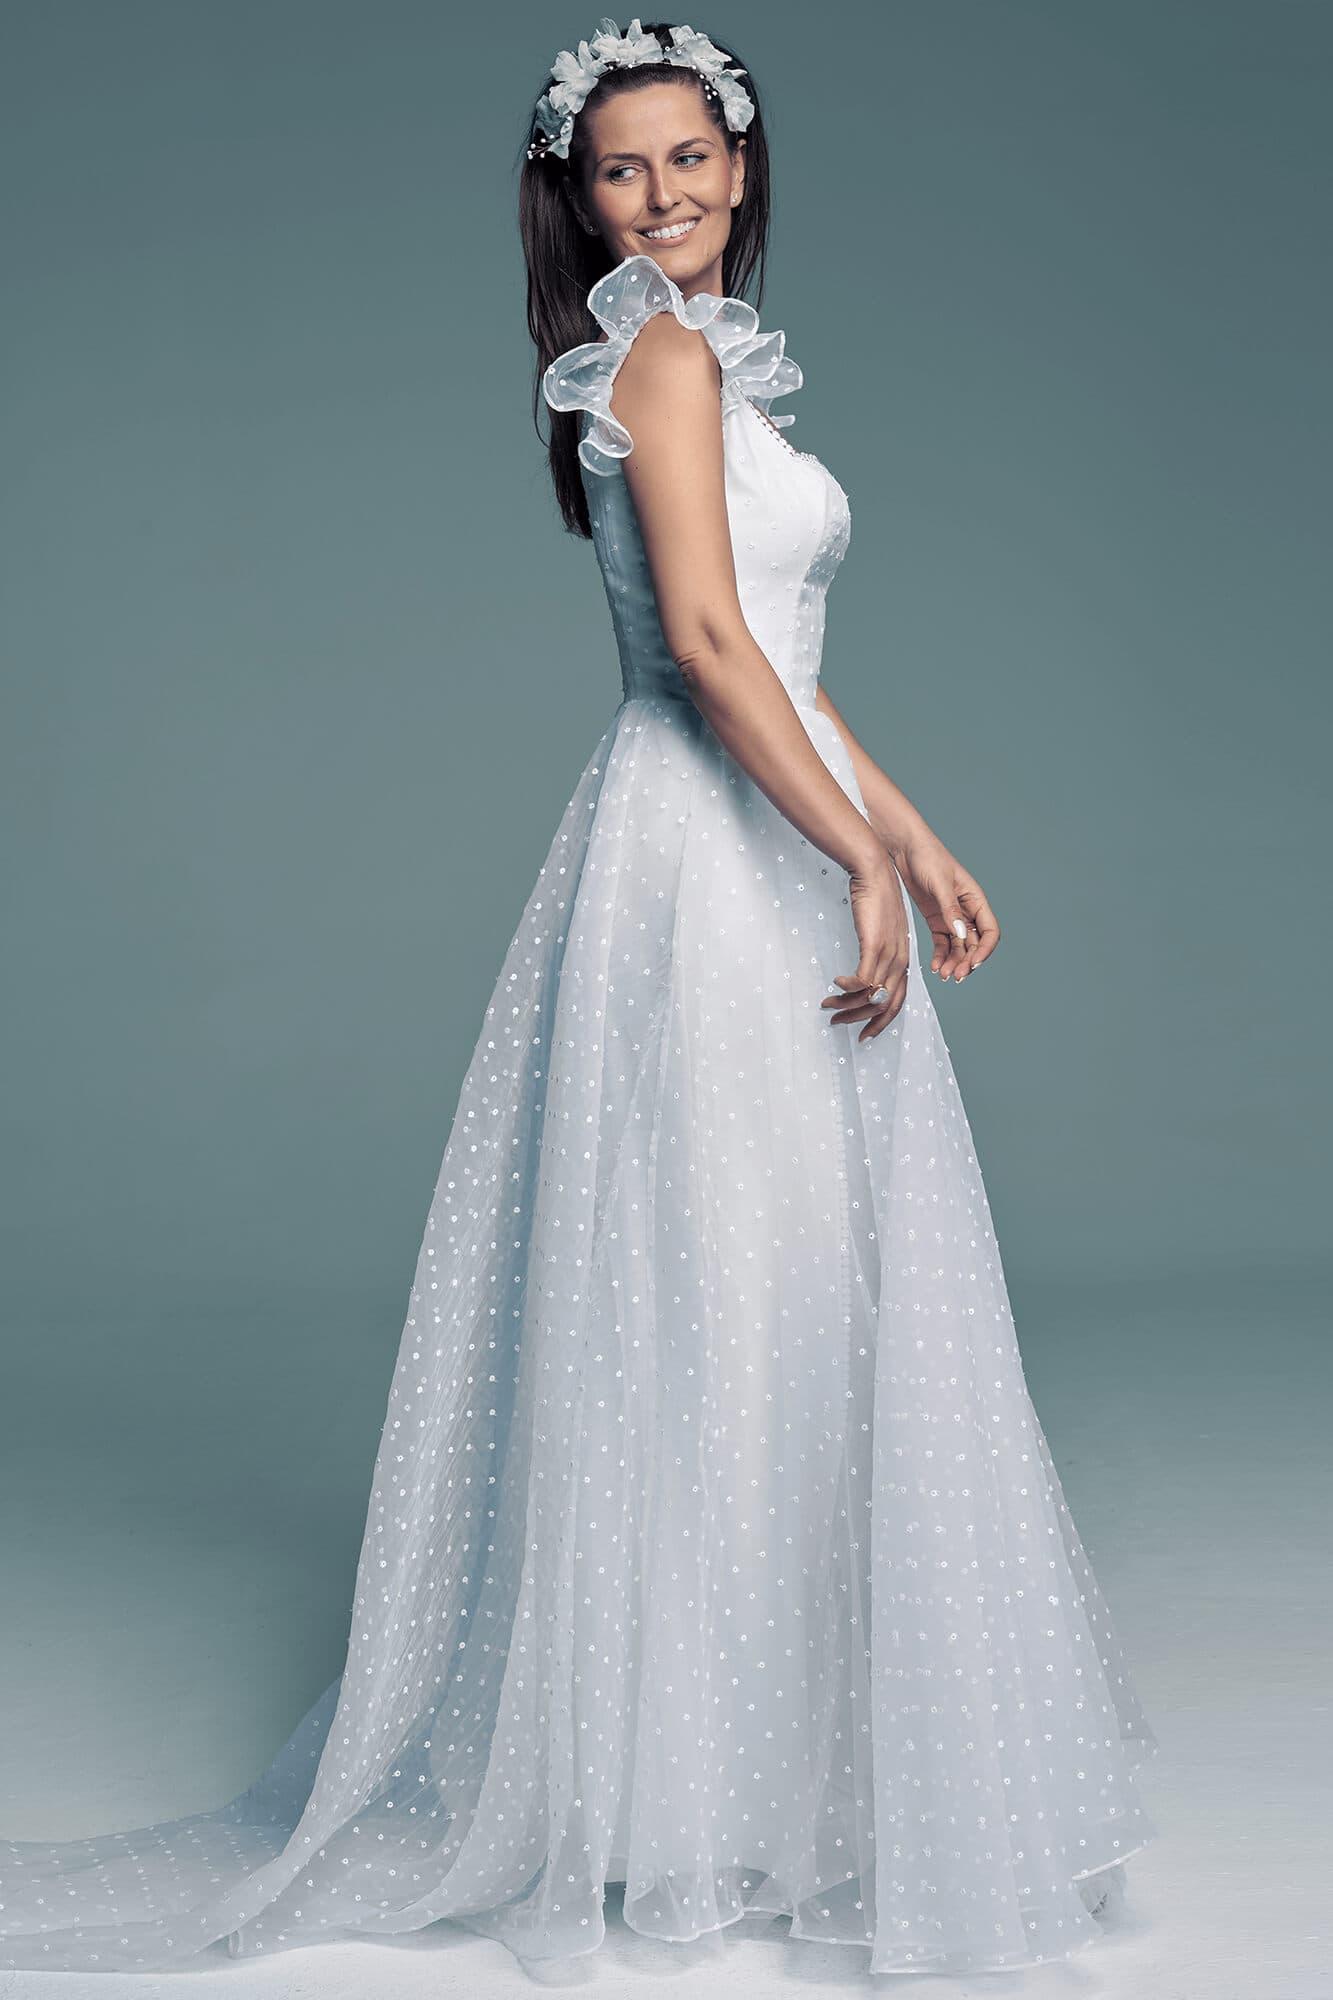 Disney wedding dress with square neckline Barcelona 27